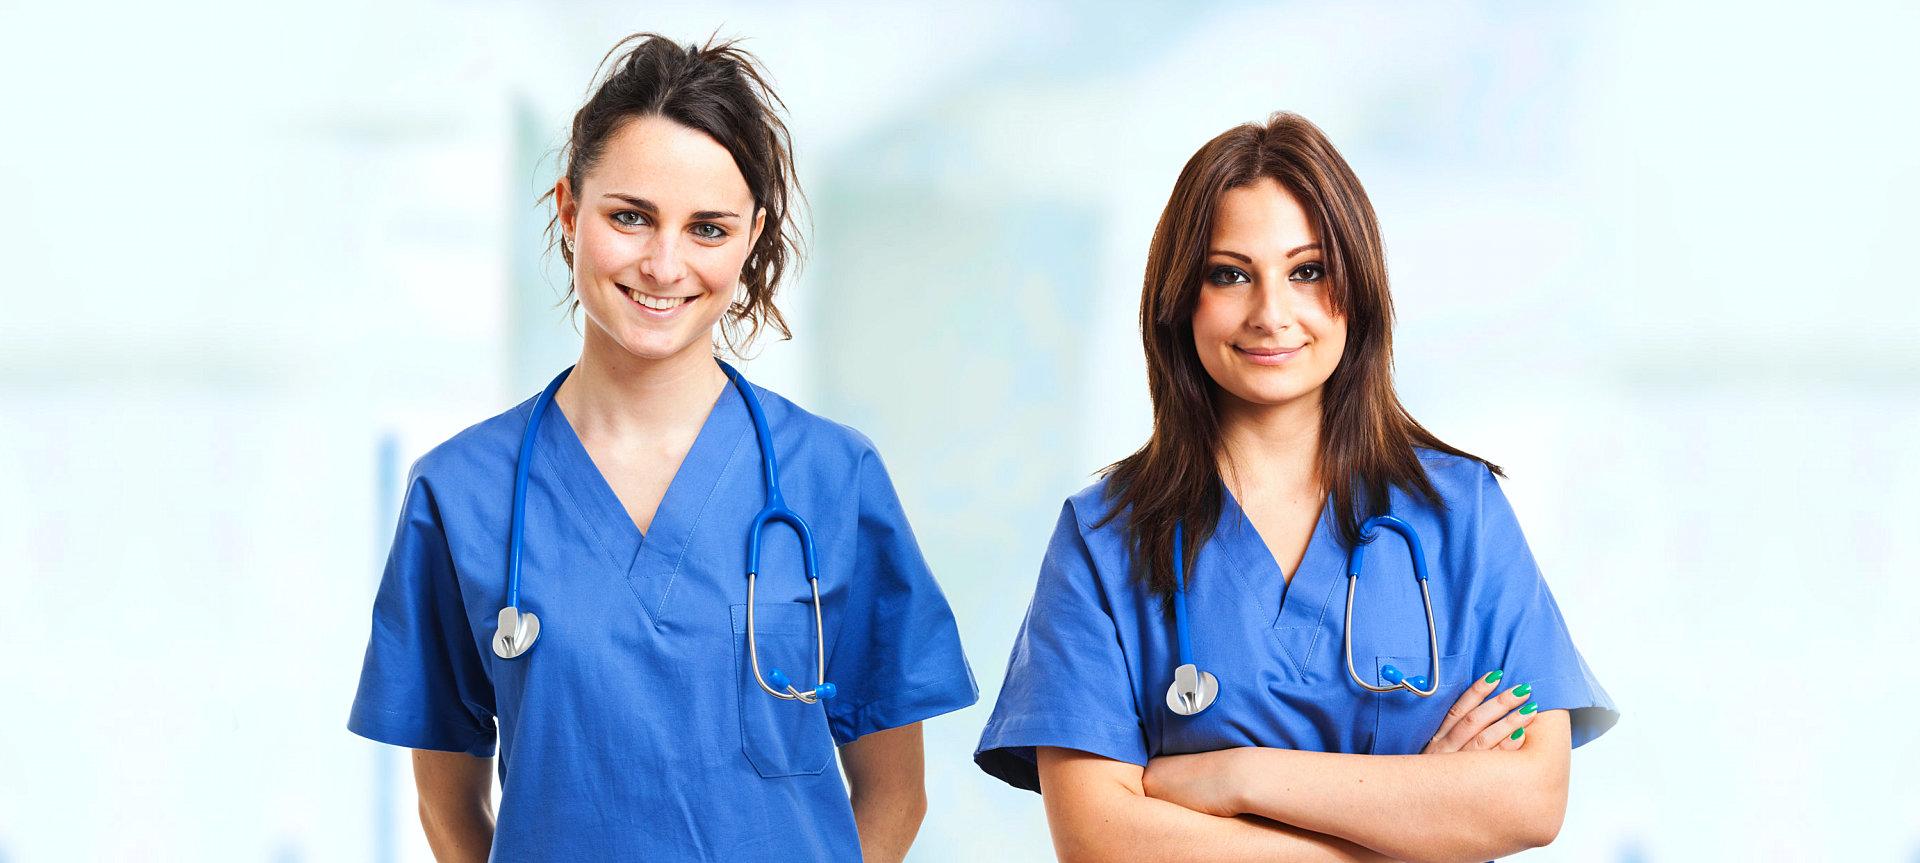 two female nurses smiling